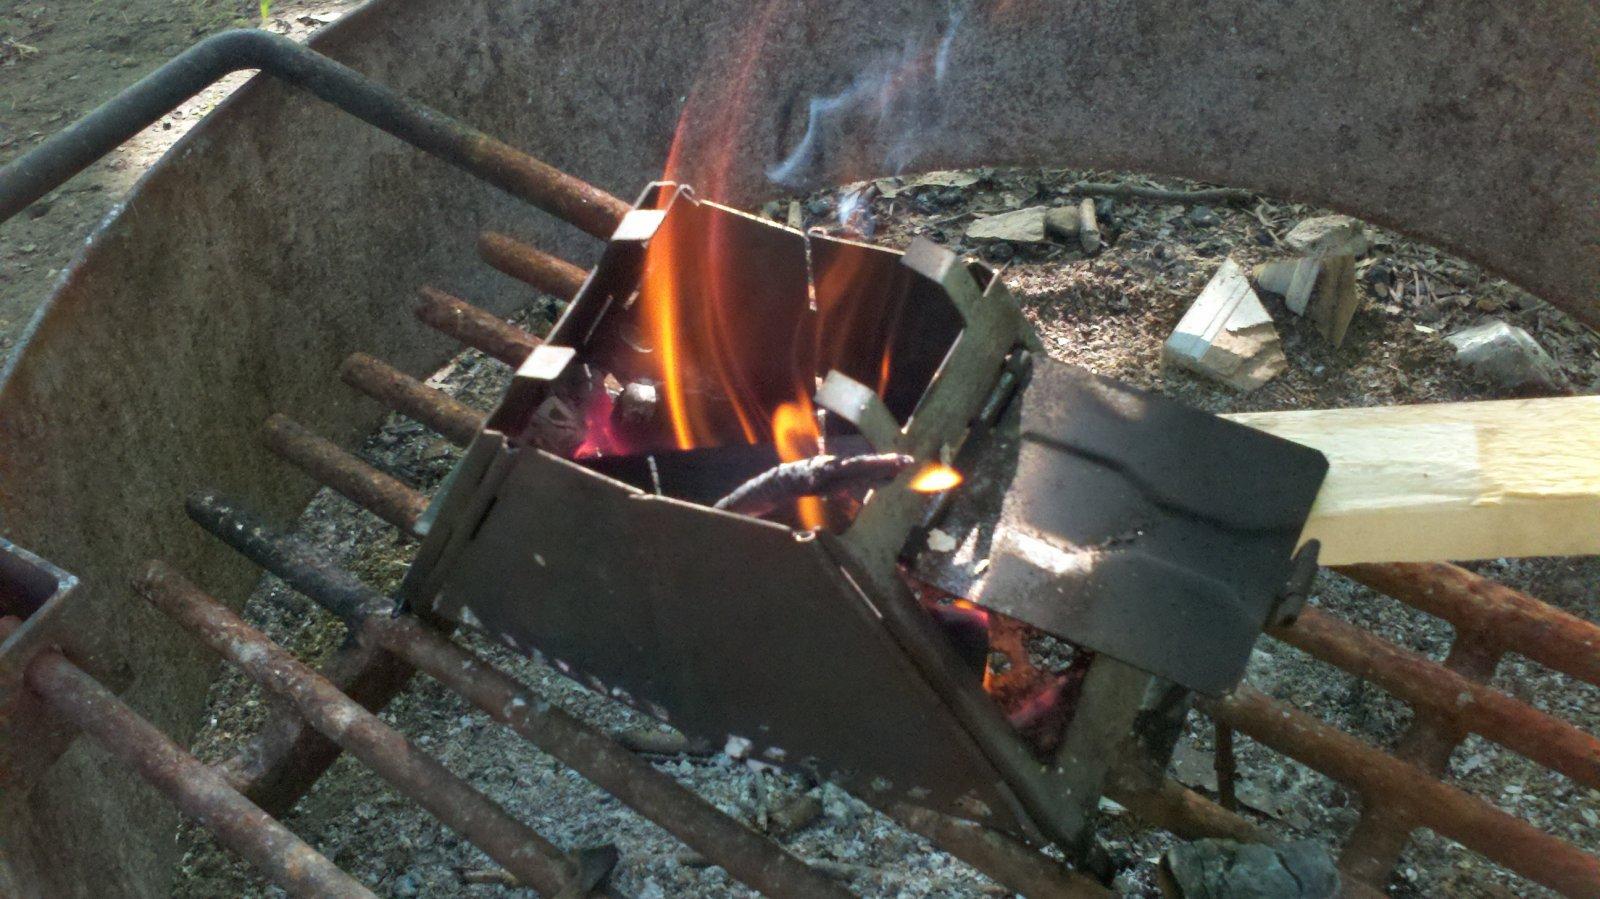 Click image for larger version  Name:Pocket stove Barkcamp State Park.jpg Views:37 Size:257.7 KB ID:41926